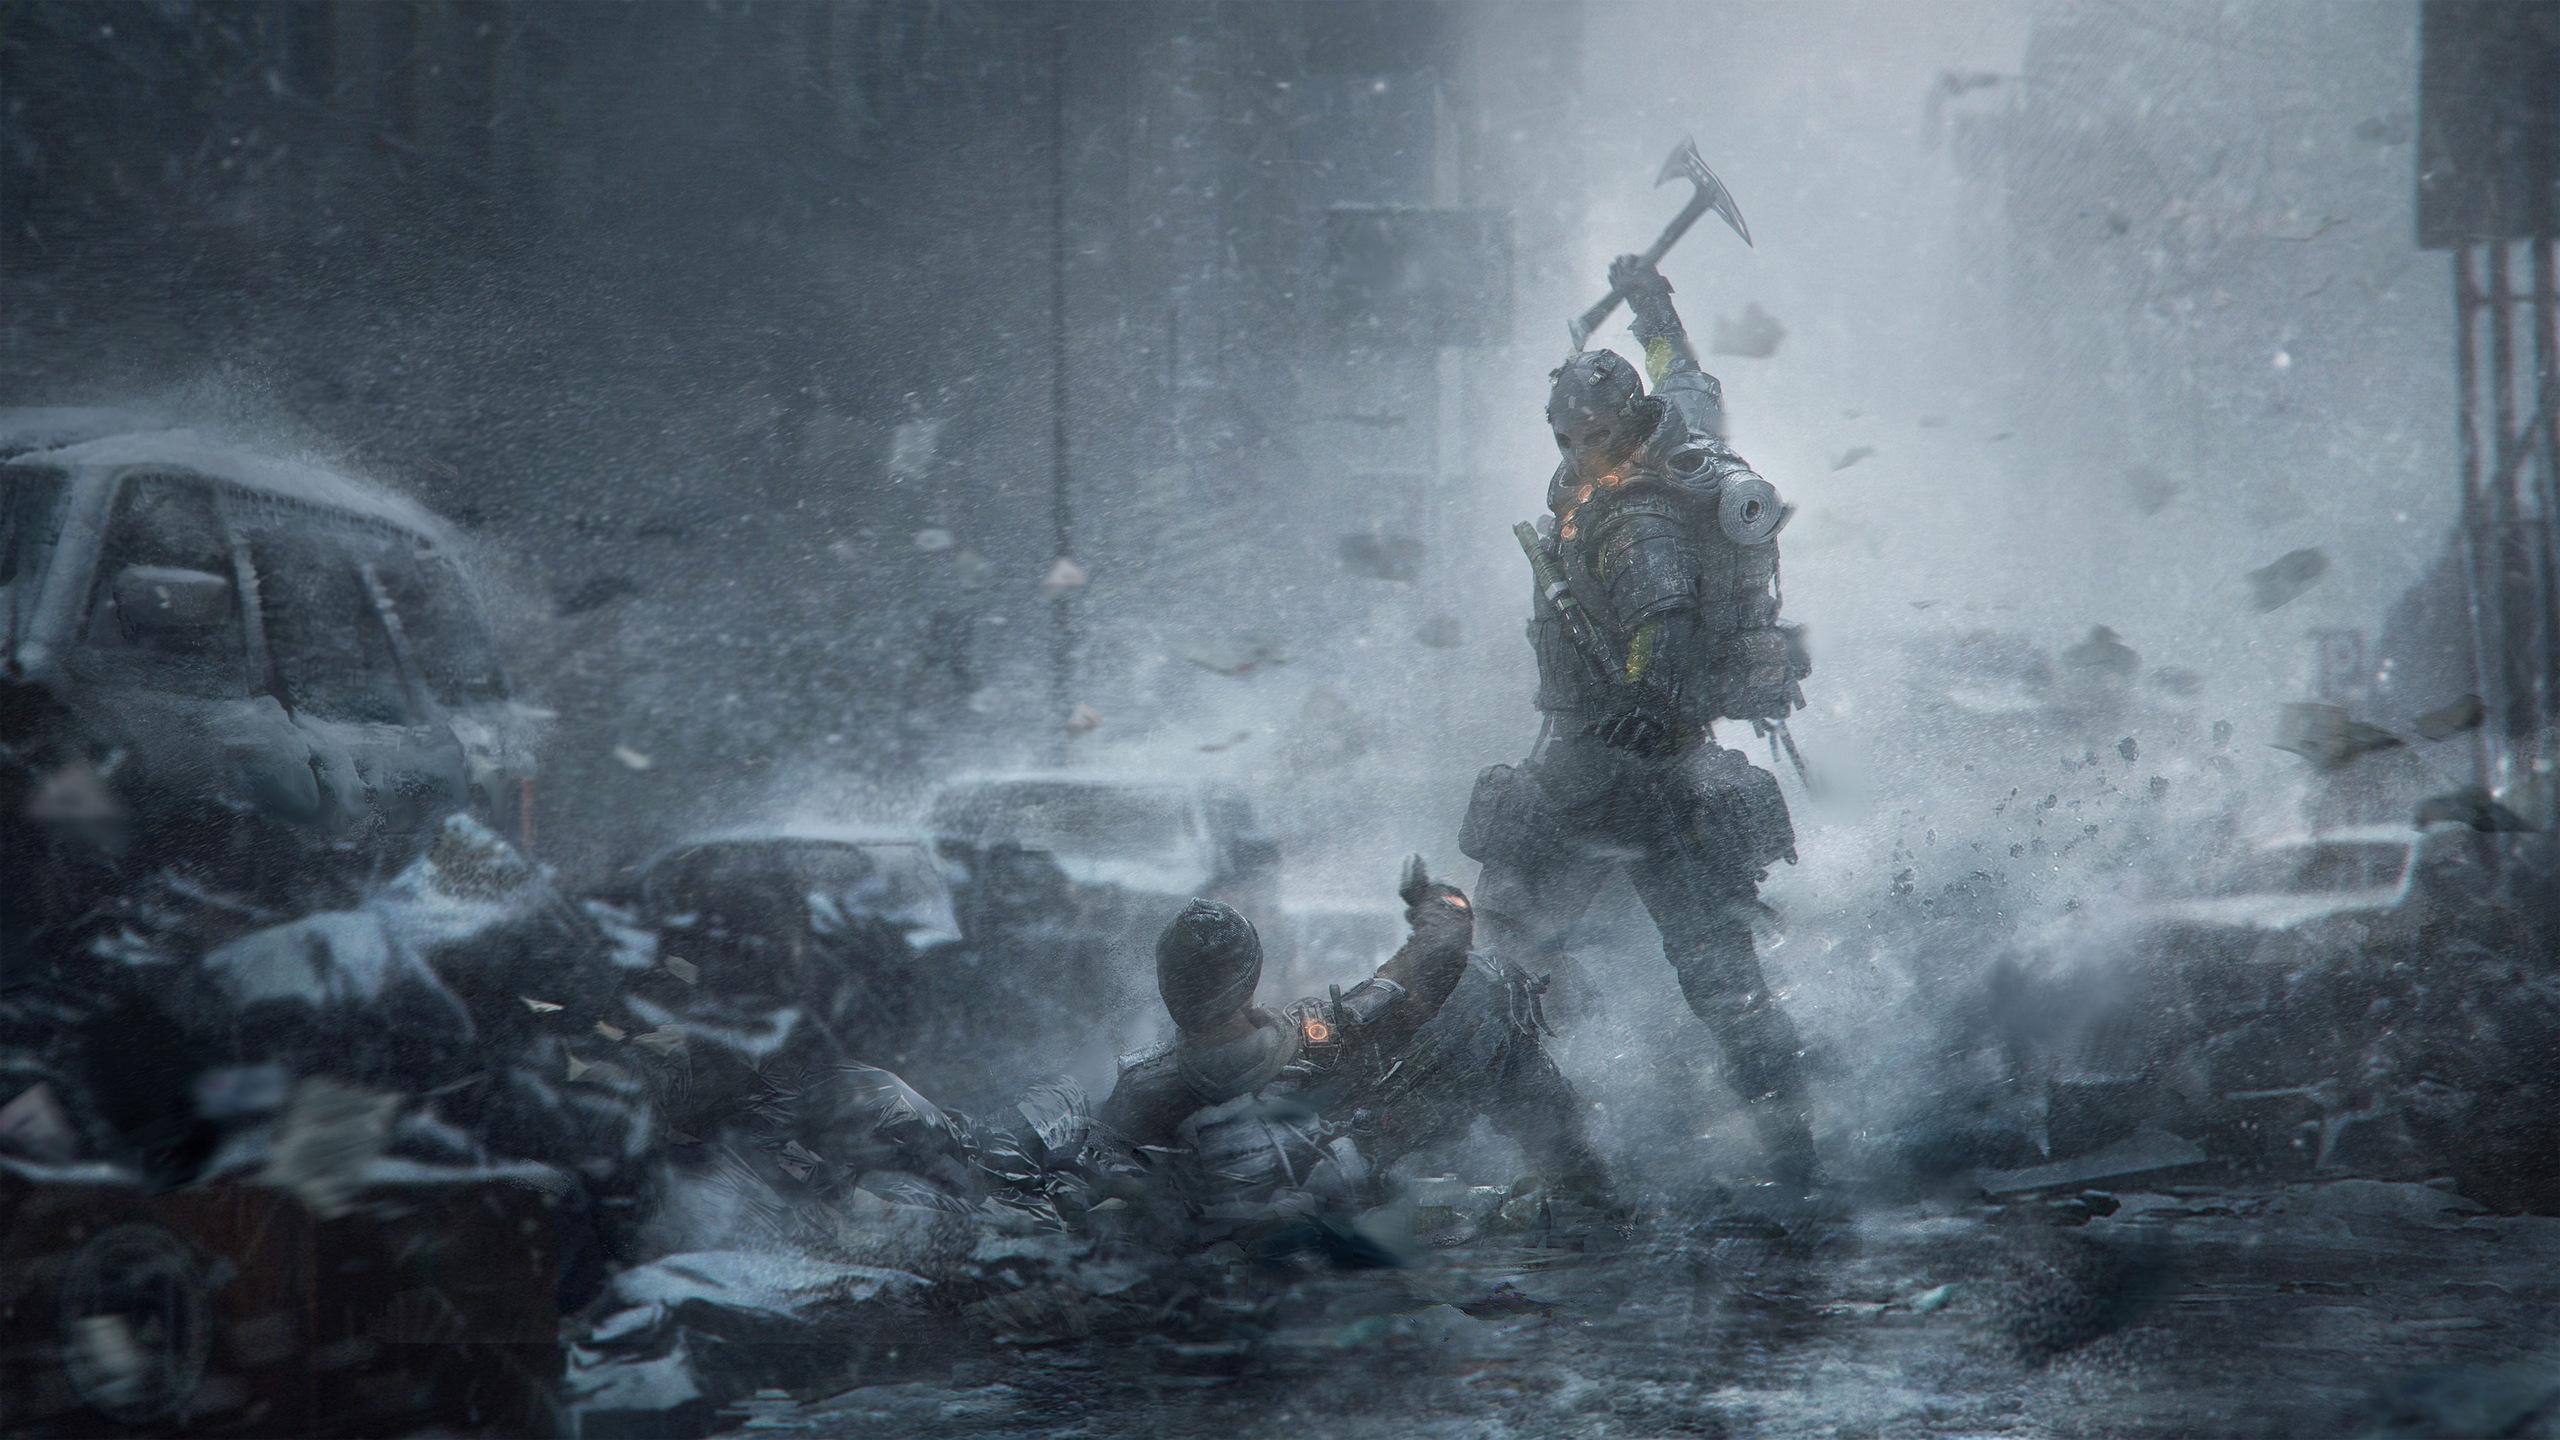 Rainbow Six Siege Wallpaper 4k: 2560x1440 Tom Clancys The Division Survival Artwork 1440P